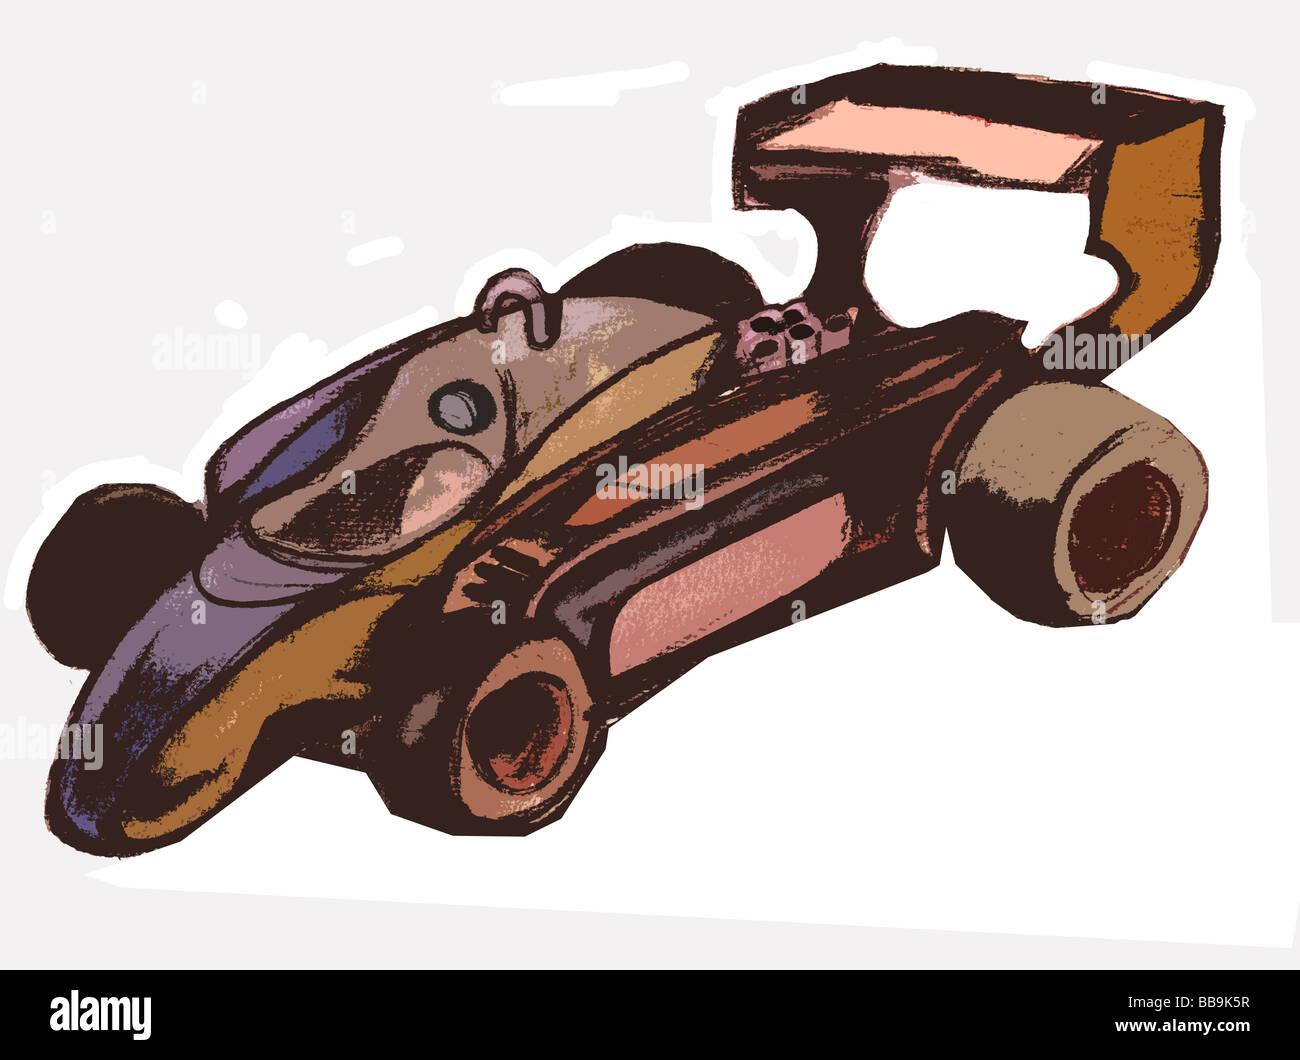 sketch of a formula 1 car - Stock Image